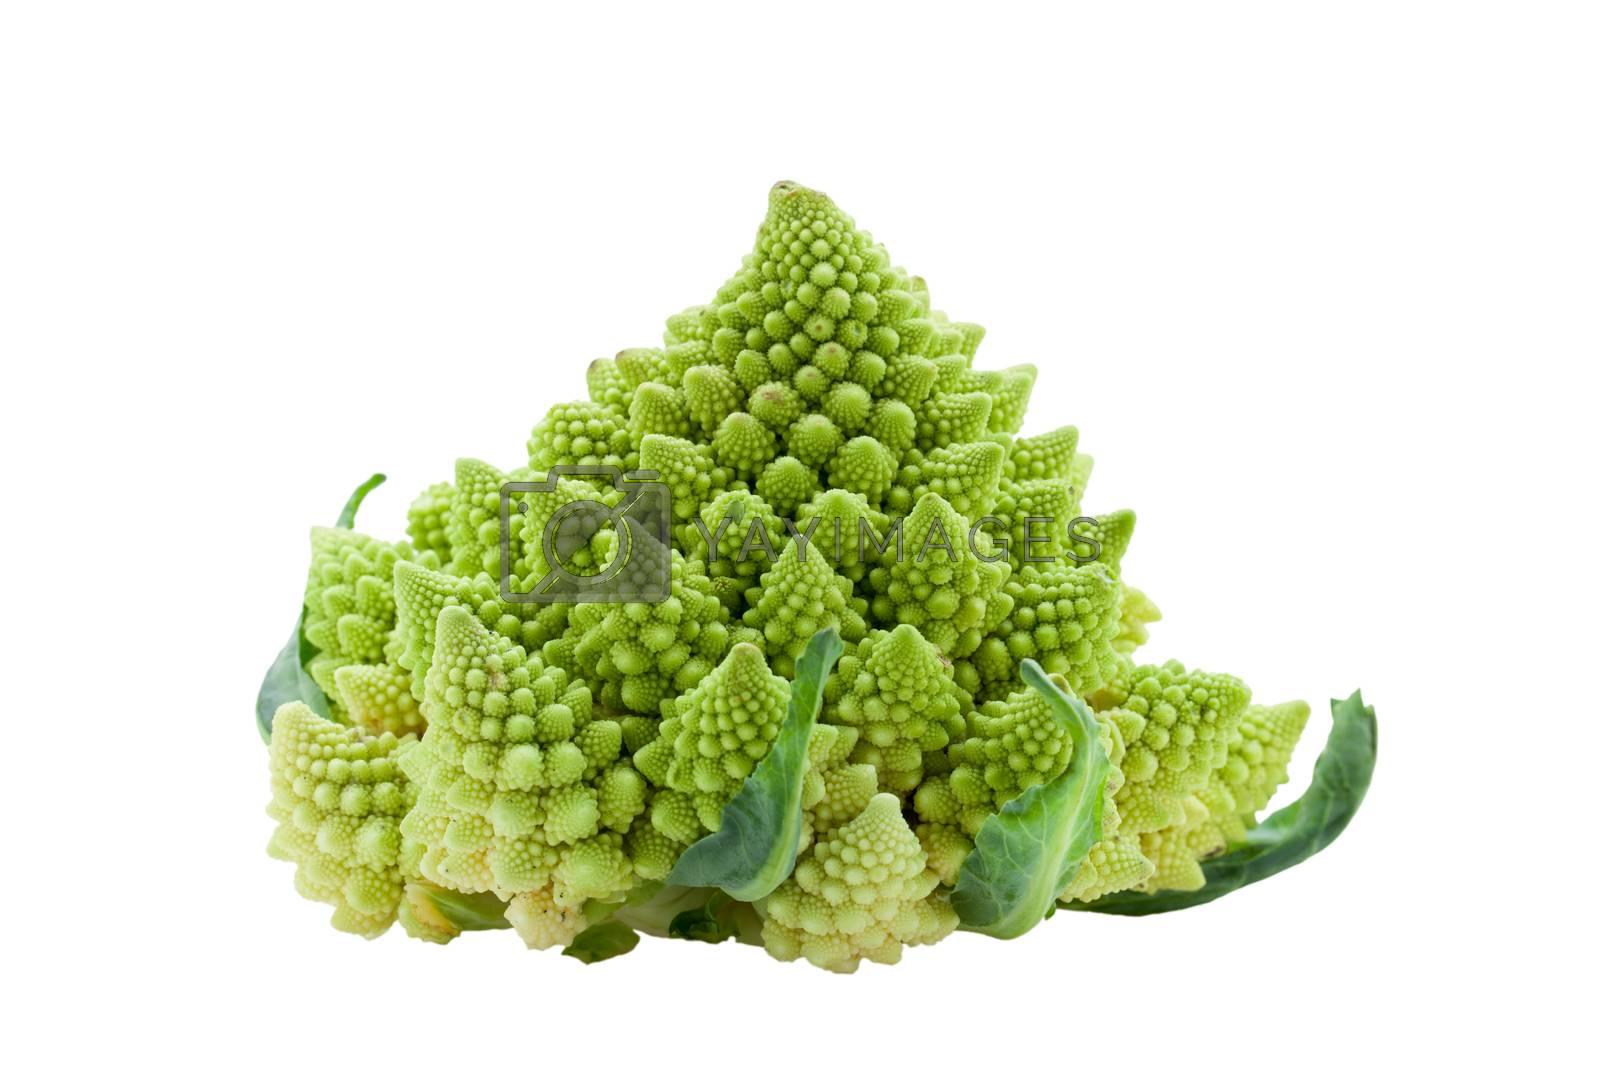 Royalty free image of Ripe vegetable romanesco broccoli or cauliflower cabbage isolate by SergeyAK